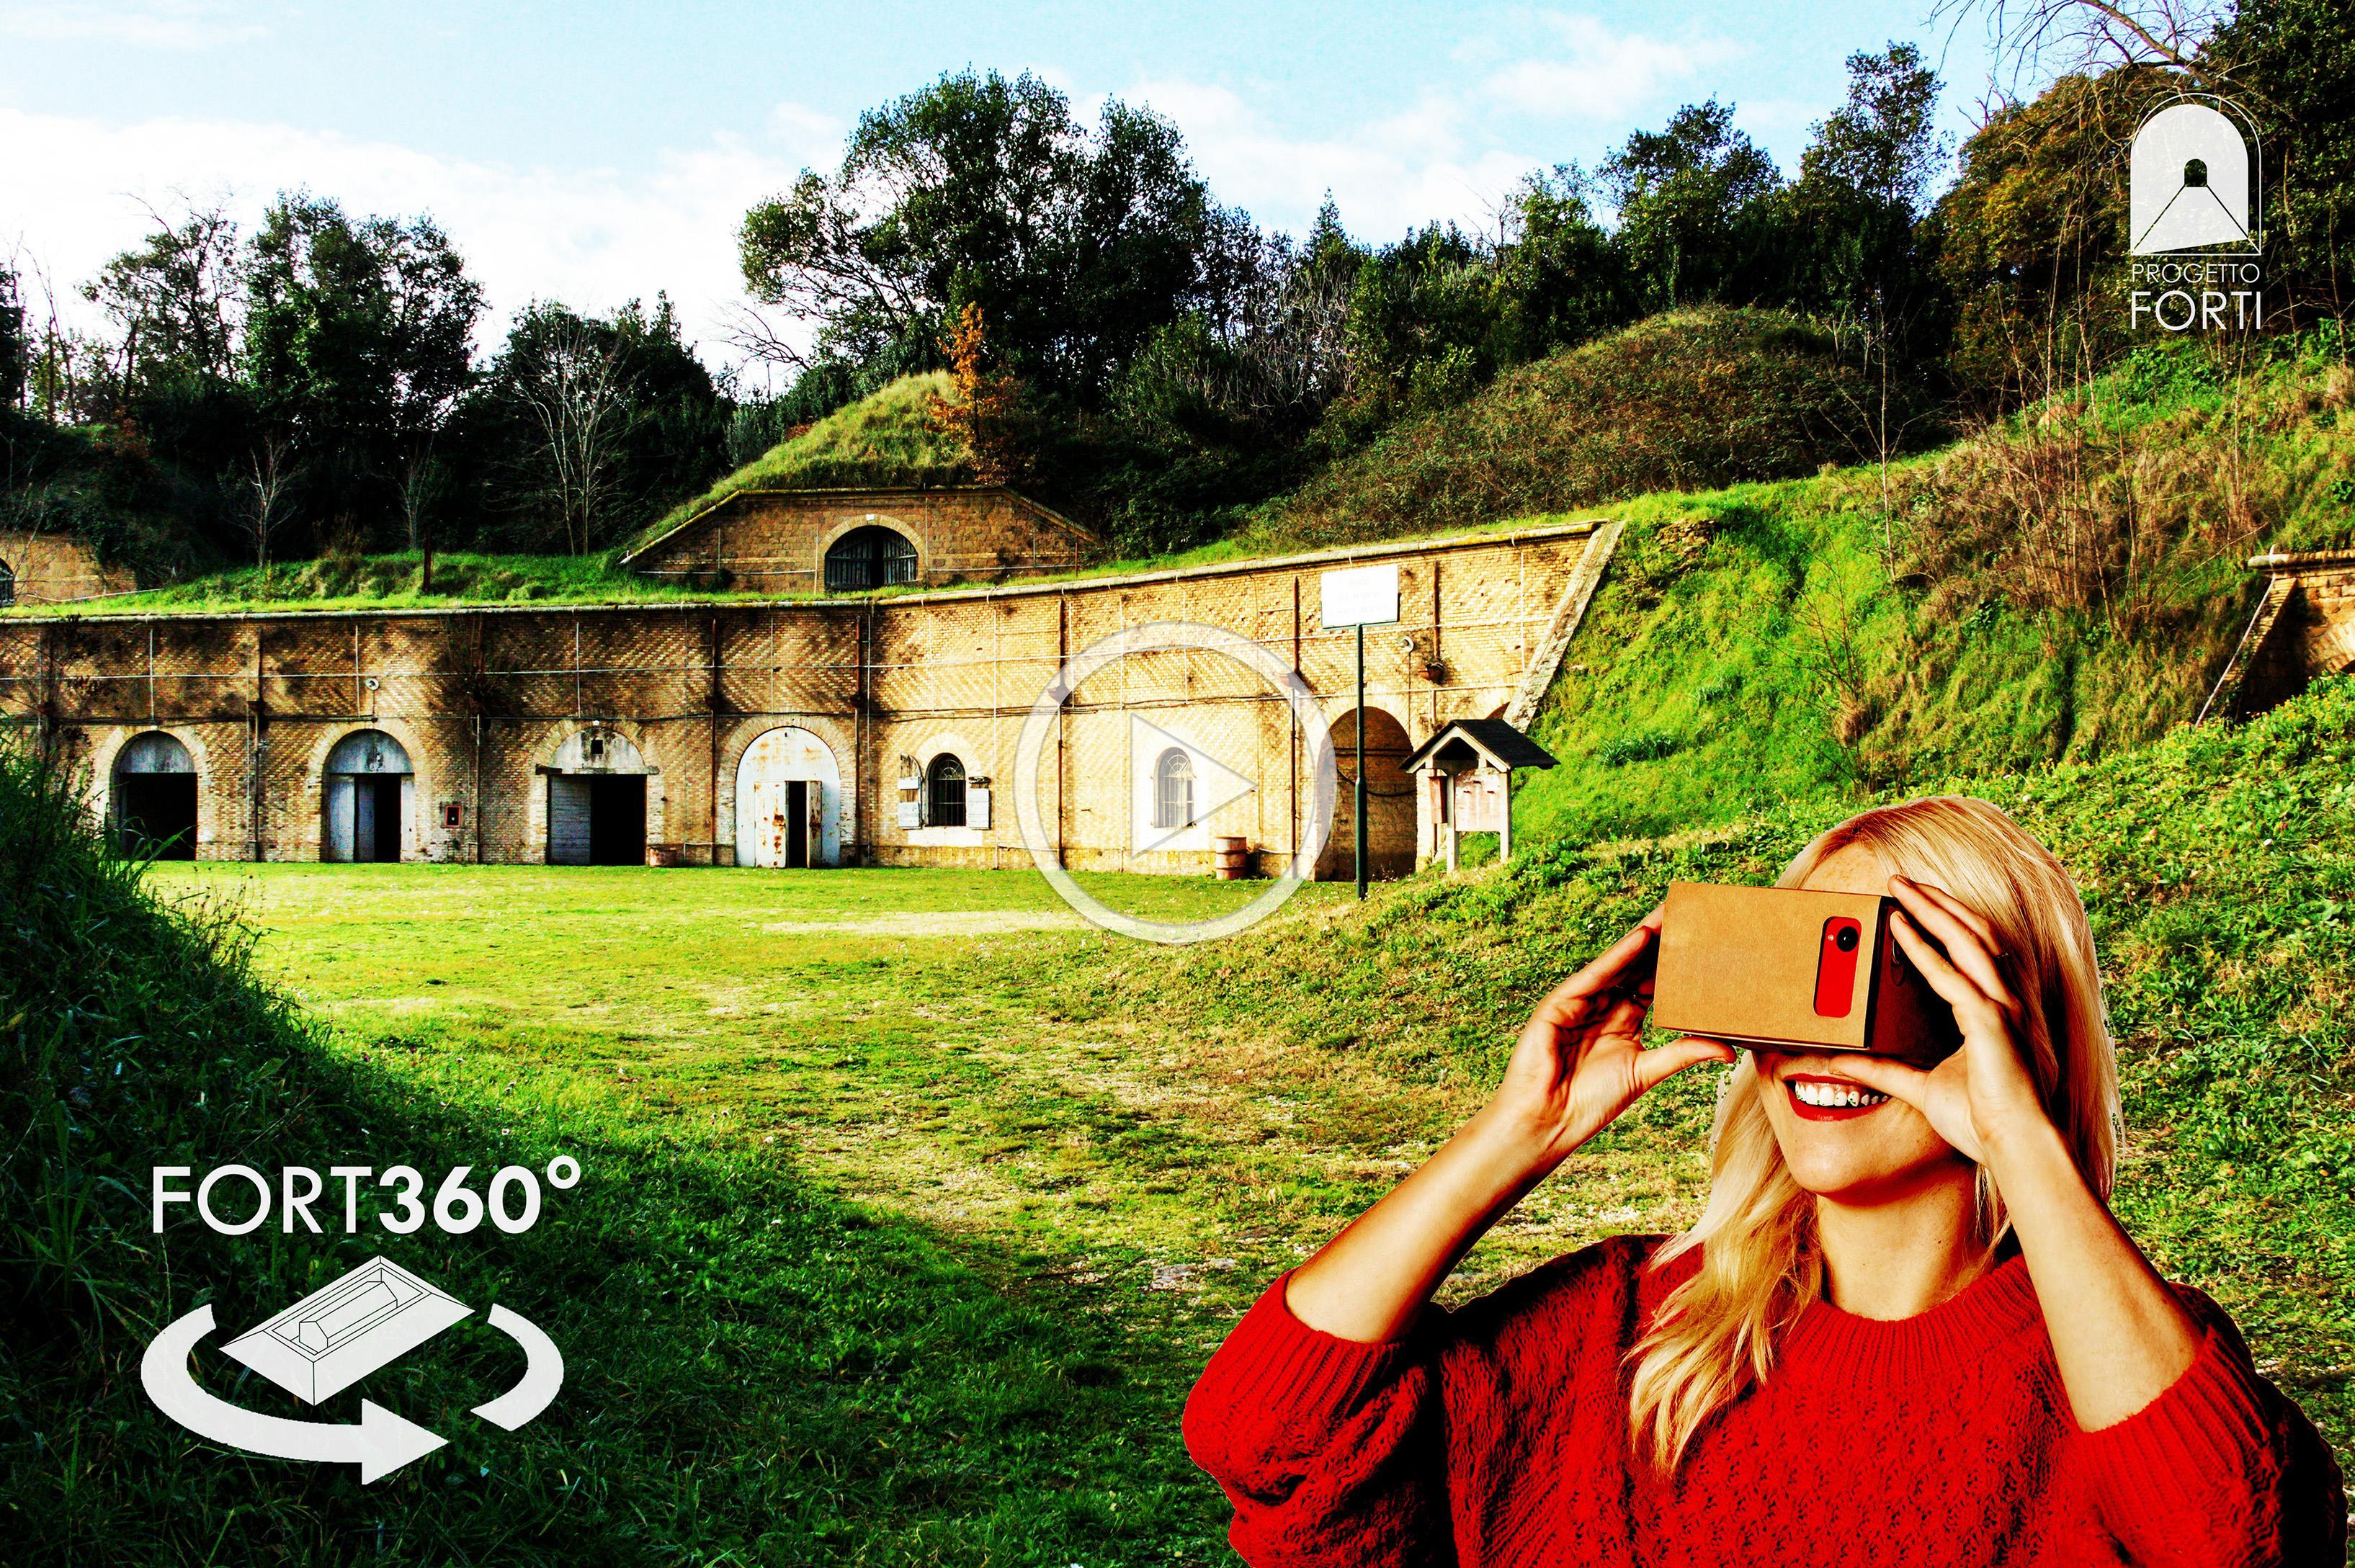 FORT360_FOR[tress]ESSANTA